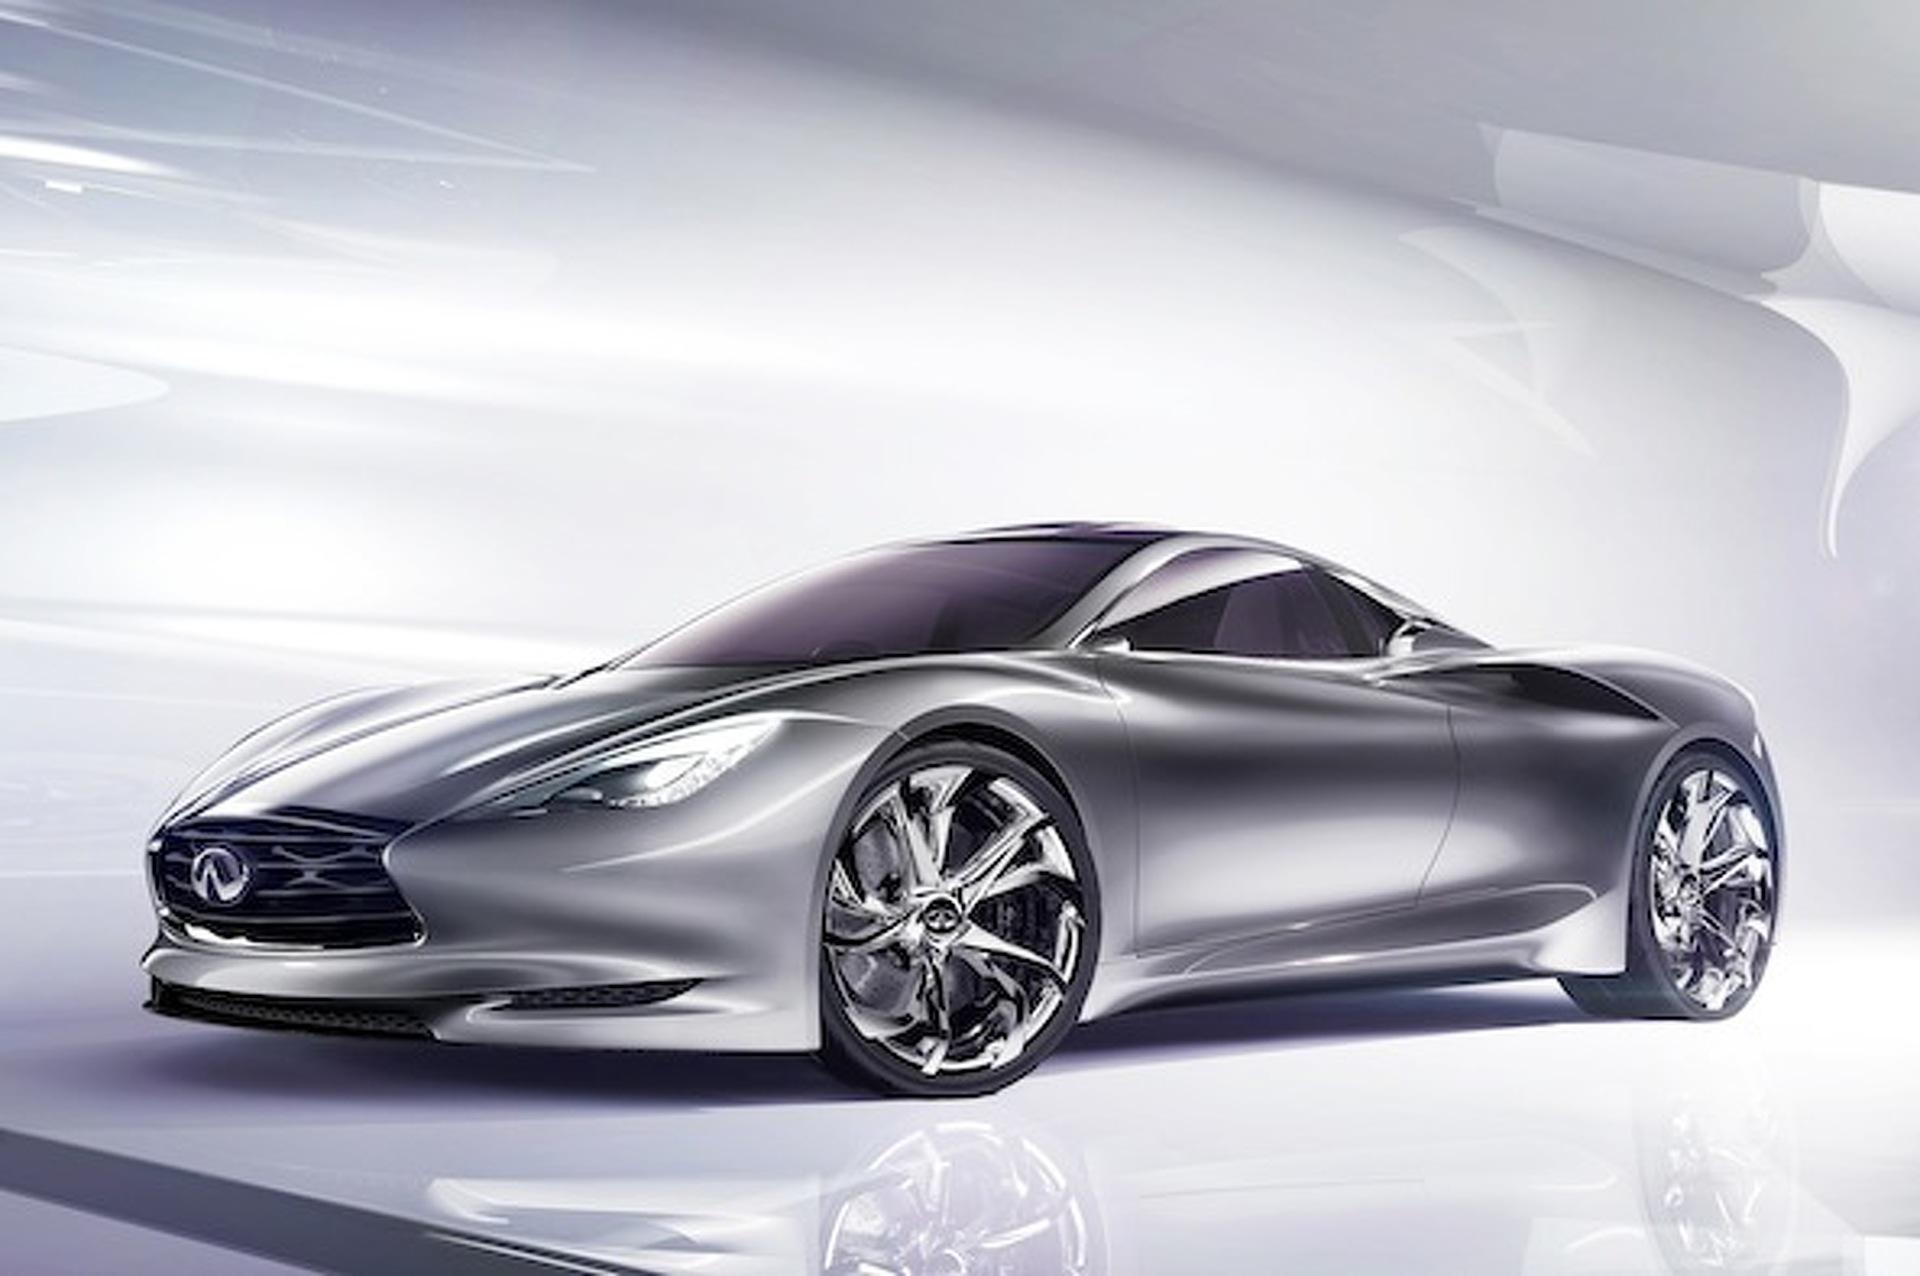 2018 infiniti supercar. fine supercar intended 2018 infiniti supercar n